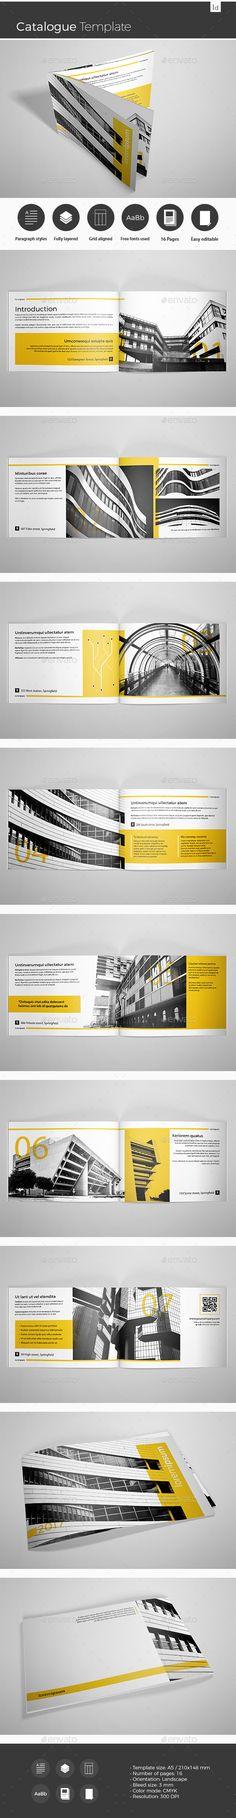 #Catalogue Template - Catalogs #Brochures Download here: https://graphicriver.net/item/catalogue-template/19699388?ref=alena994